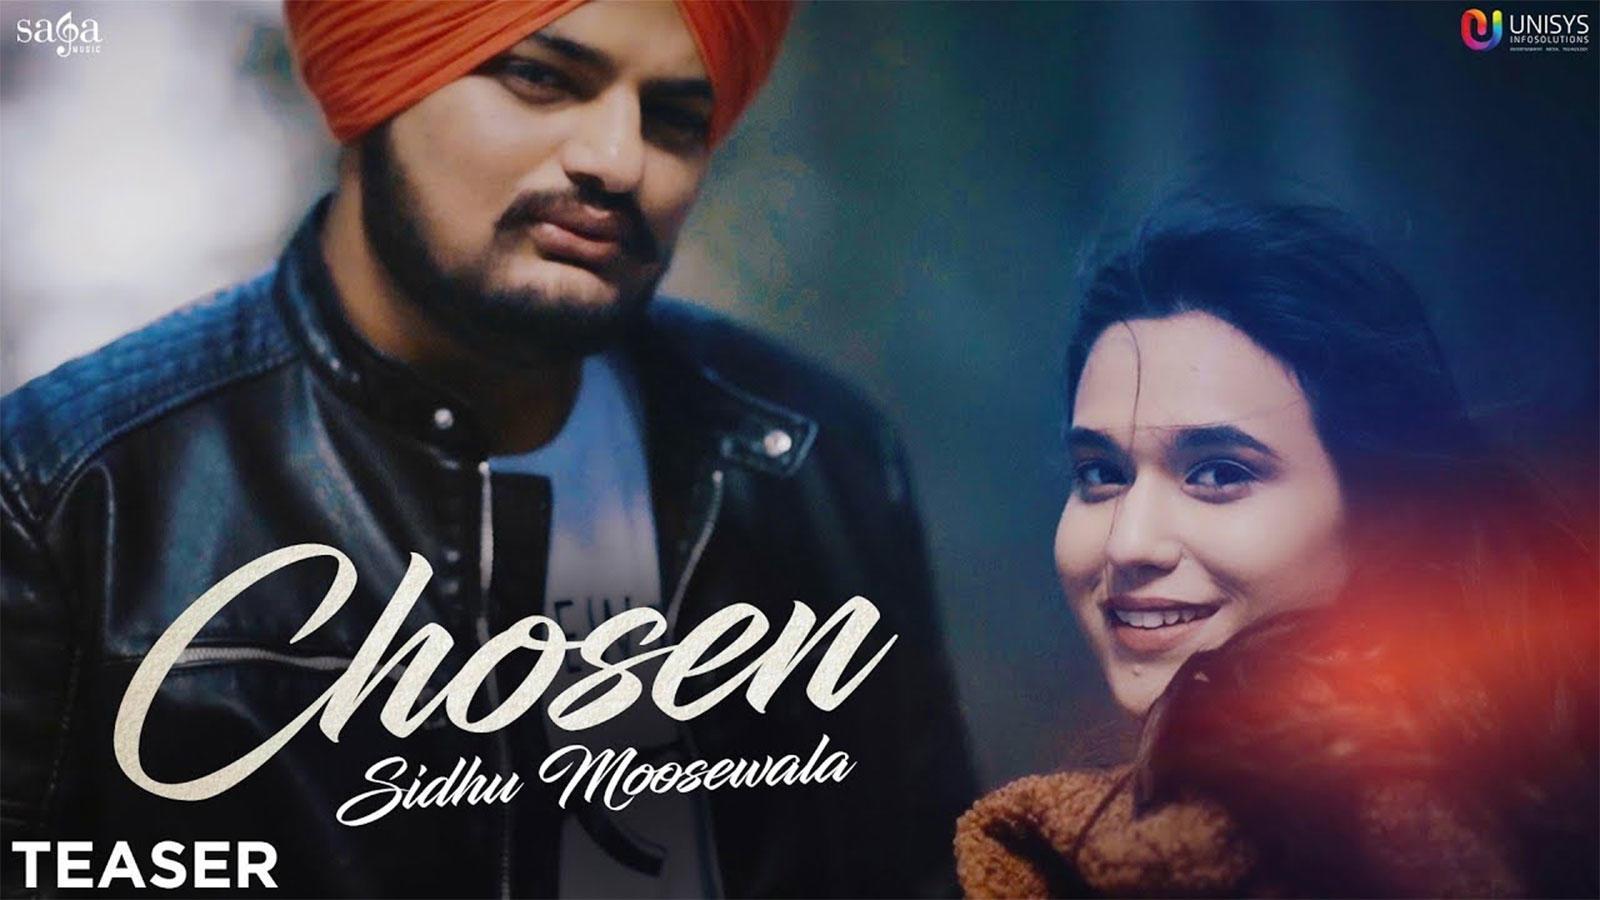 Latest Punjabi Song Chosen Sung By Sidhu Moosewala Ft  Sunny Malton (Teaser)